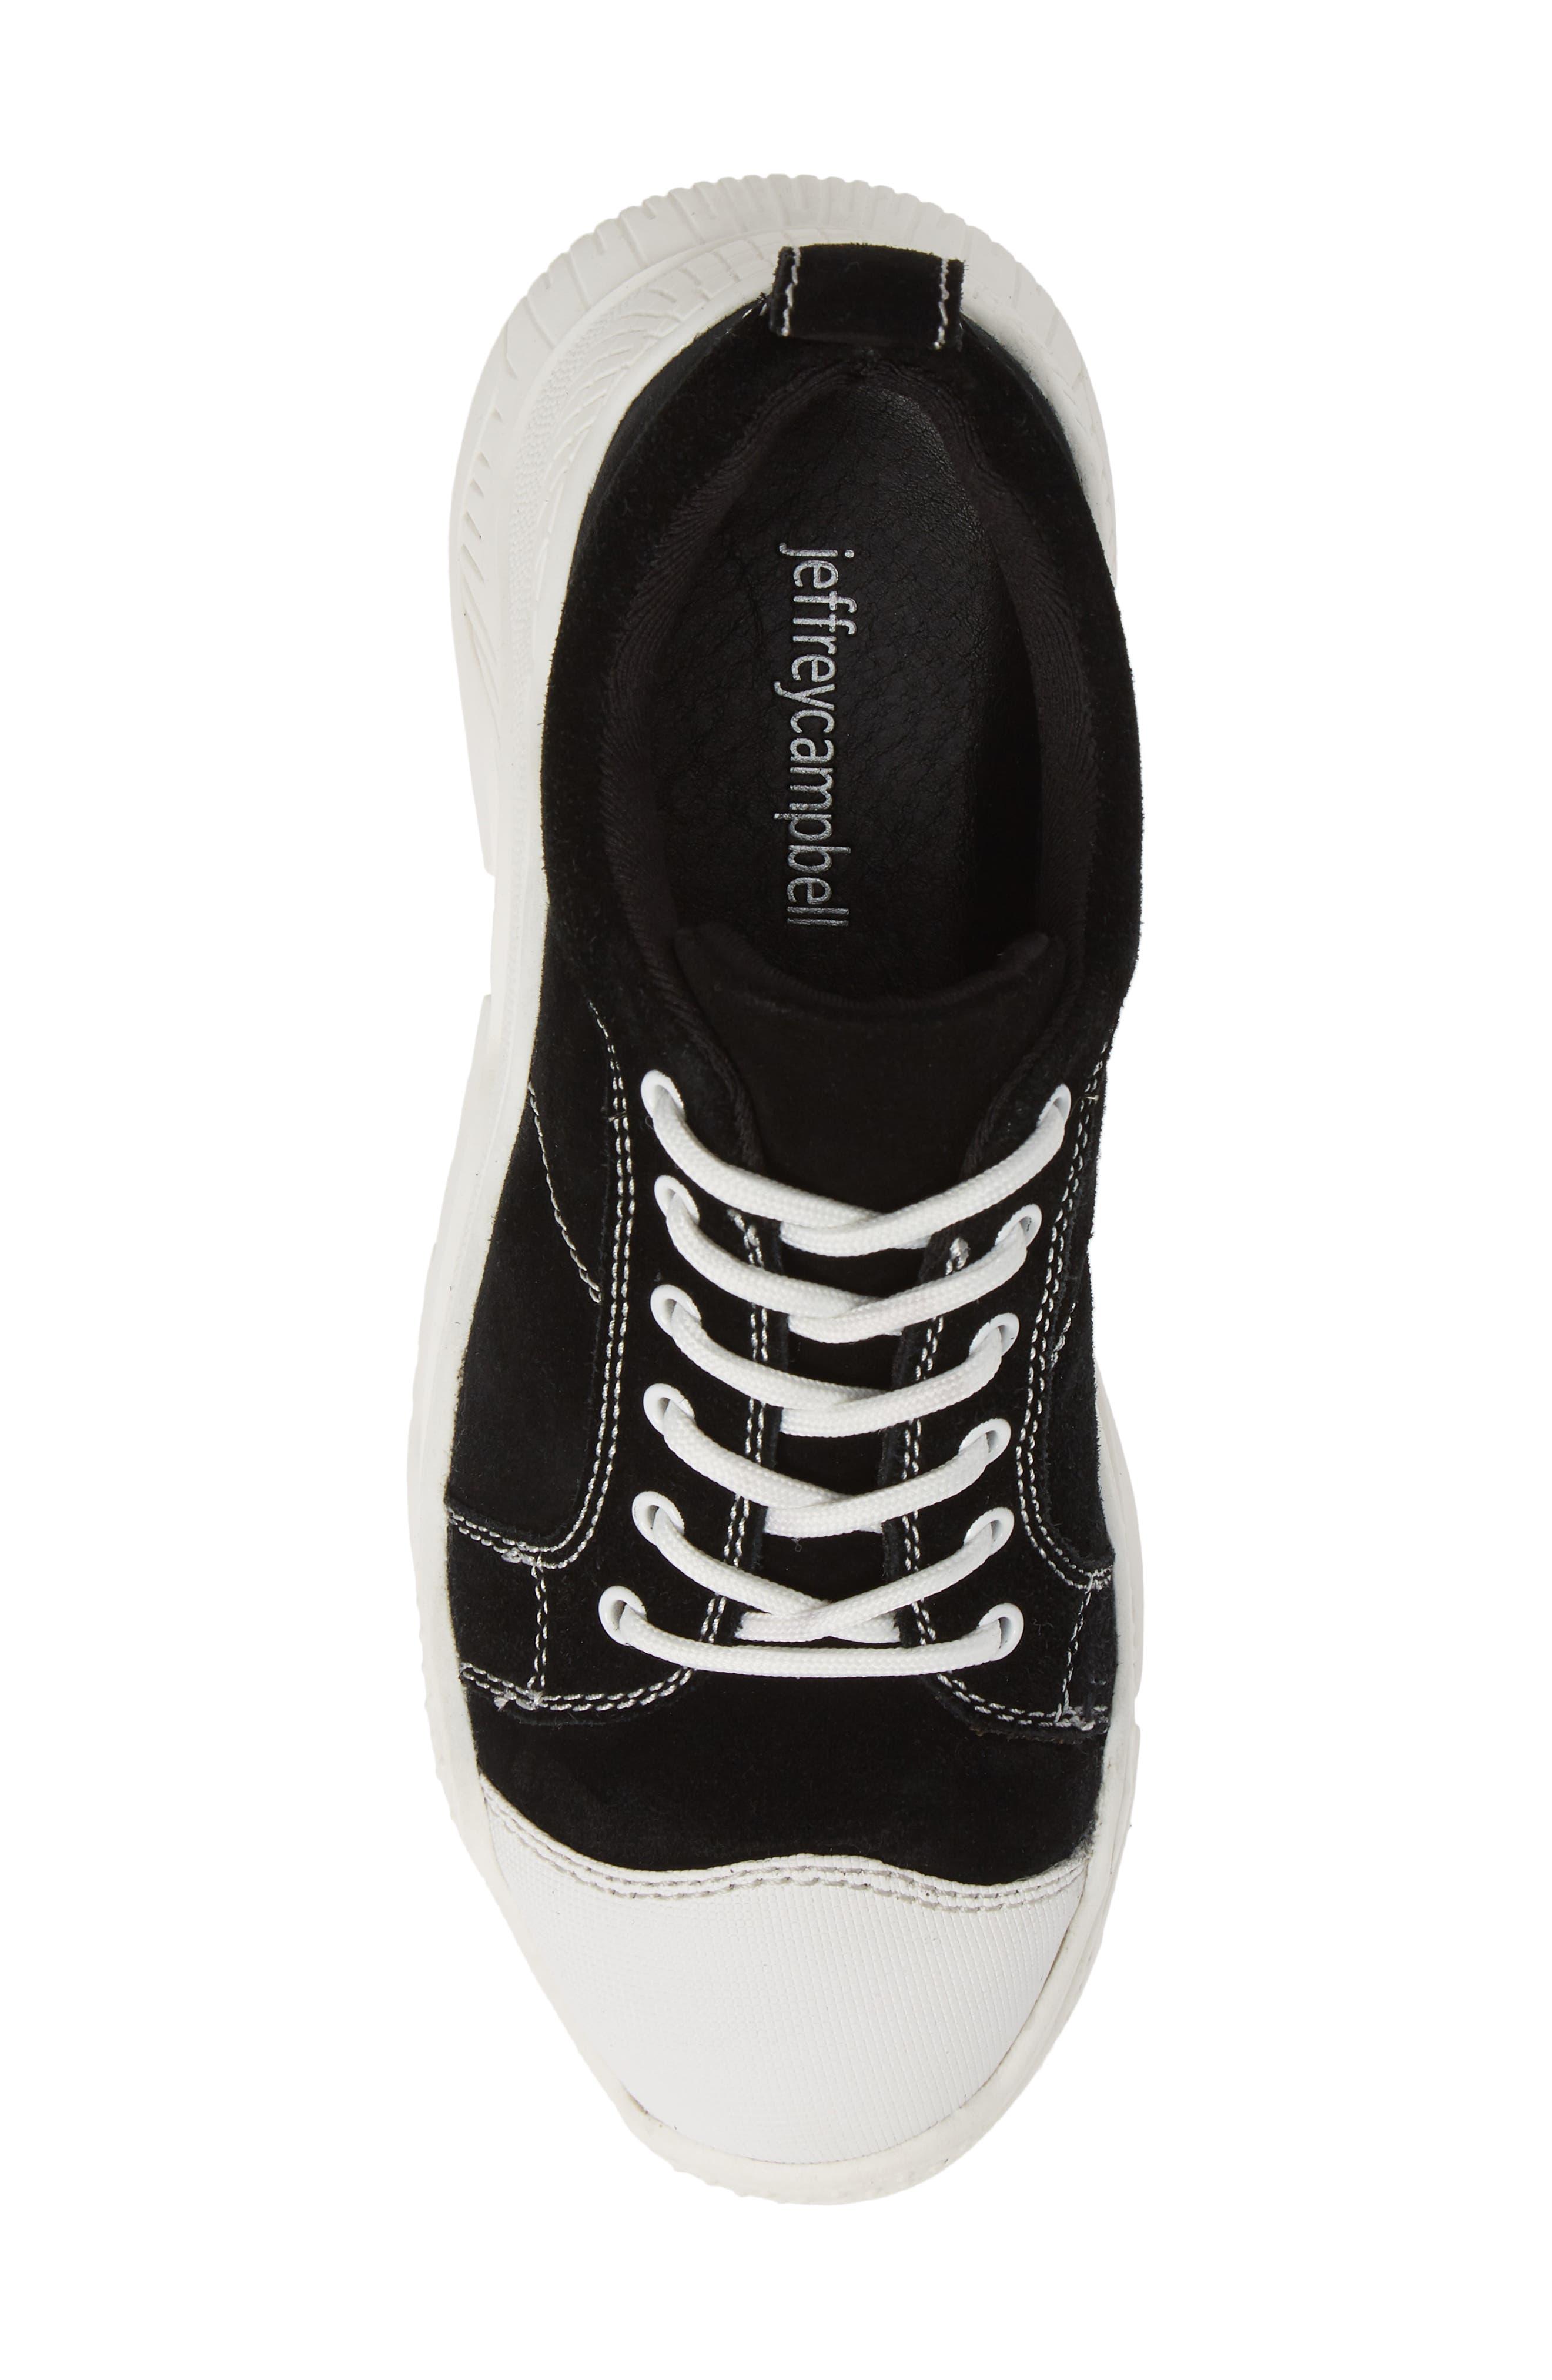 JEFFREY CAMPBELL,                             Remnant Sneaker,                             Alternate thumbnail 5, color,                             BLACK SUEDE WHITE